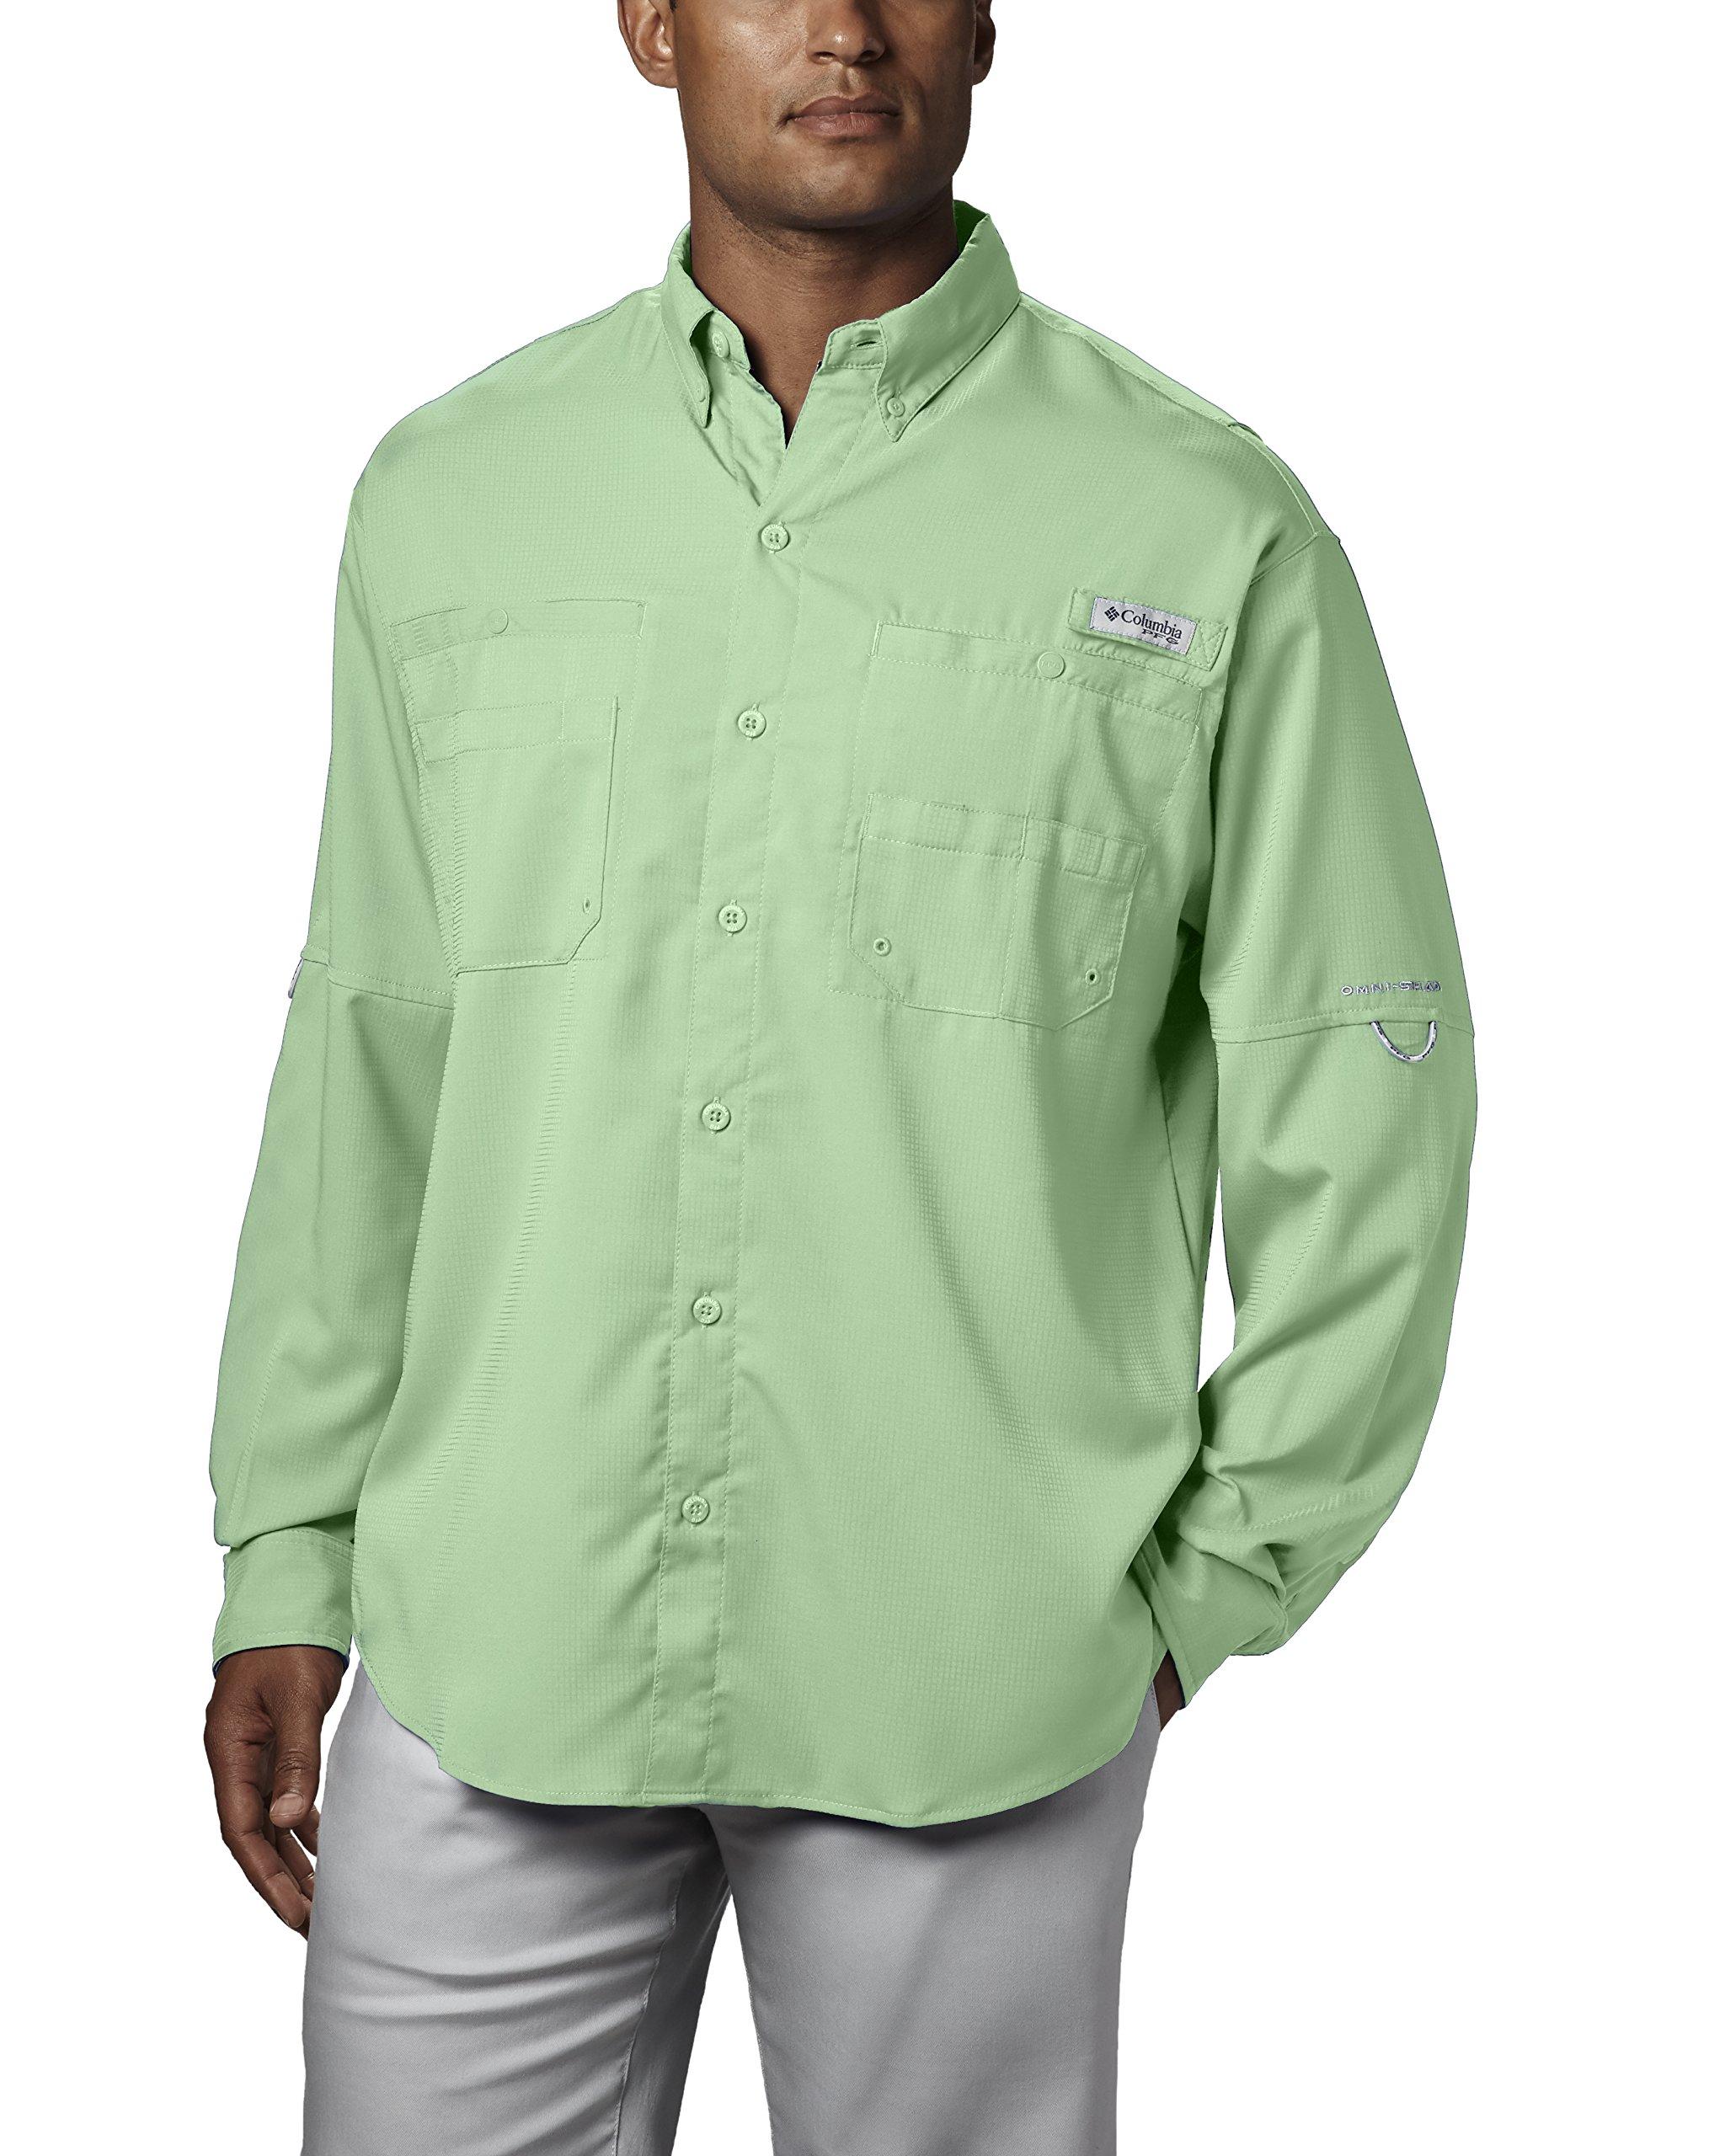 Columbia Men's Plus Tamiami II Long Sleeve Shirt, Key West - X-Small